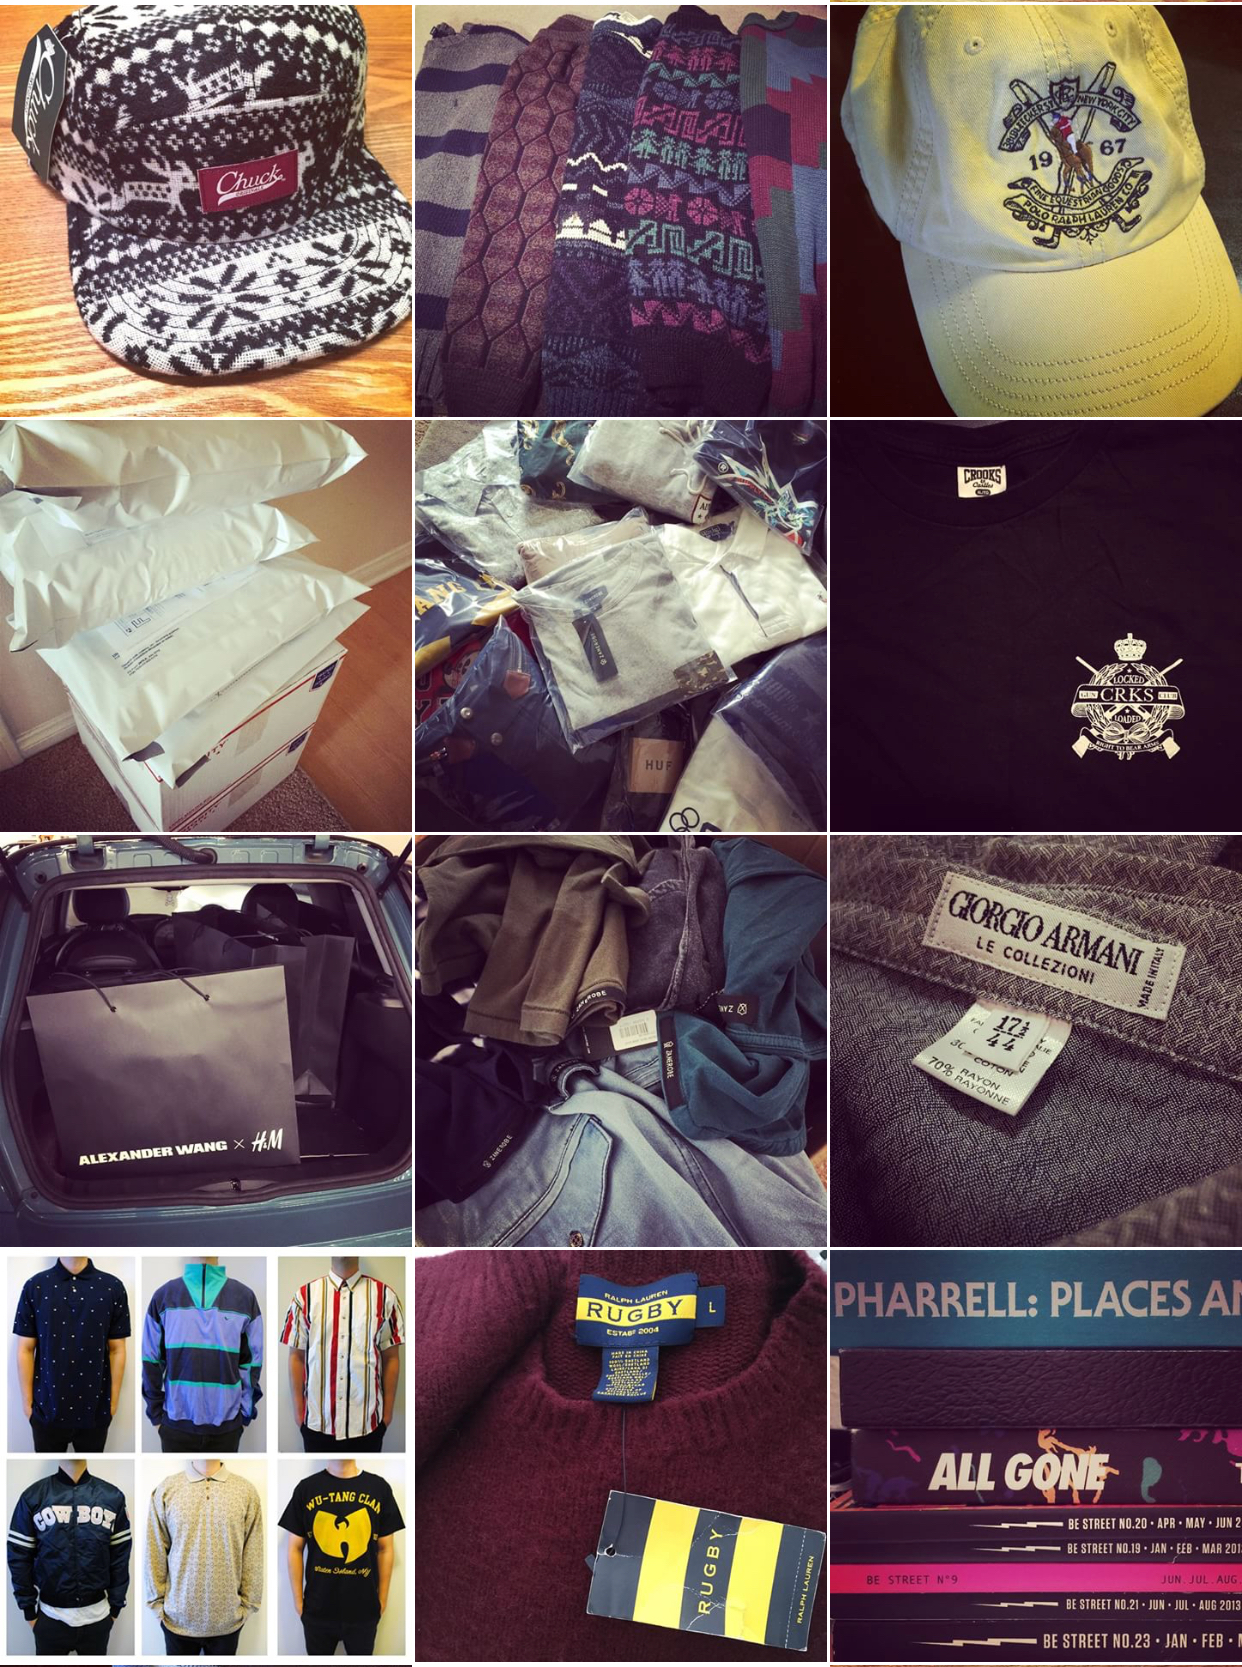 Instagram (@goodlookinout) feed from 2014.